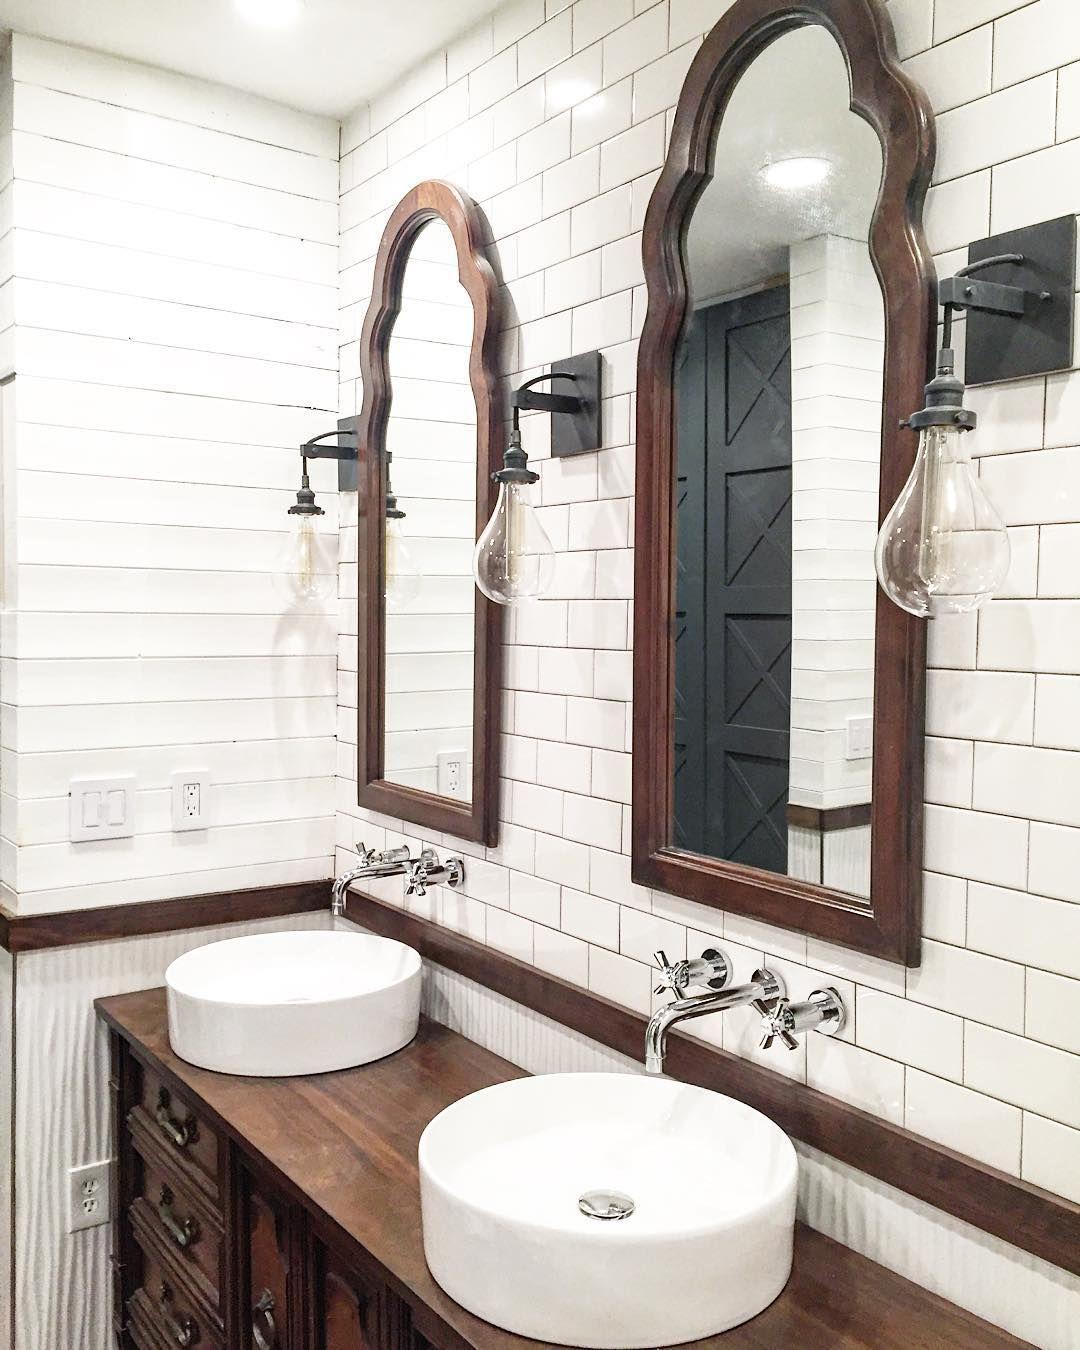 Rustic farmhouse bathroom design with plank walls and ... on Rustic Farmhouse Bathroom Tile  id=82138